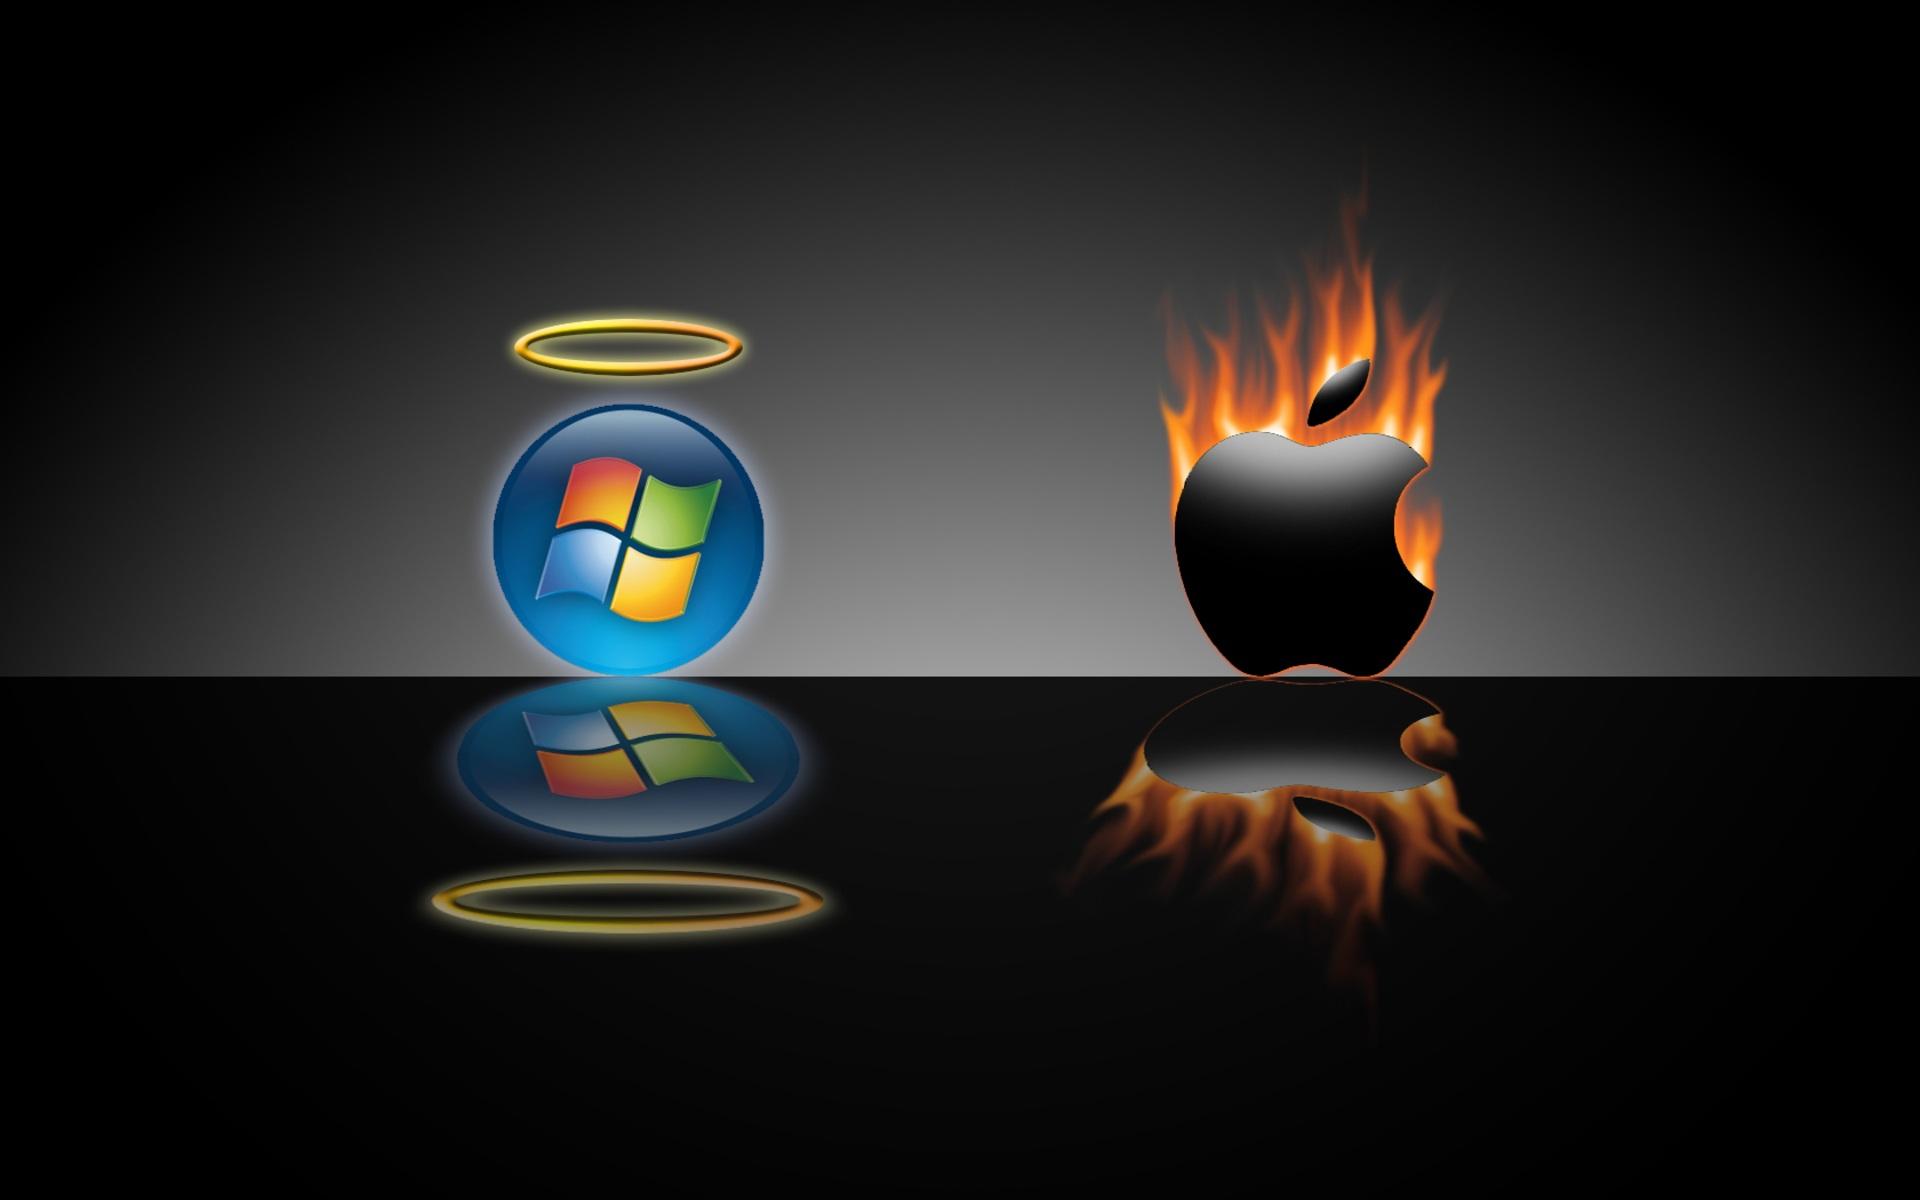 Microsoft hd wallpapers hd wallpapers pulse best microsoft hd wallpapers voltagebd Images